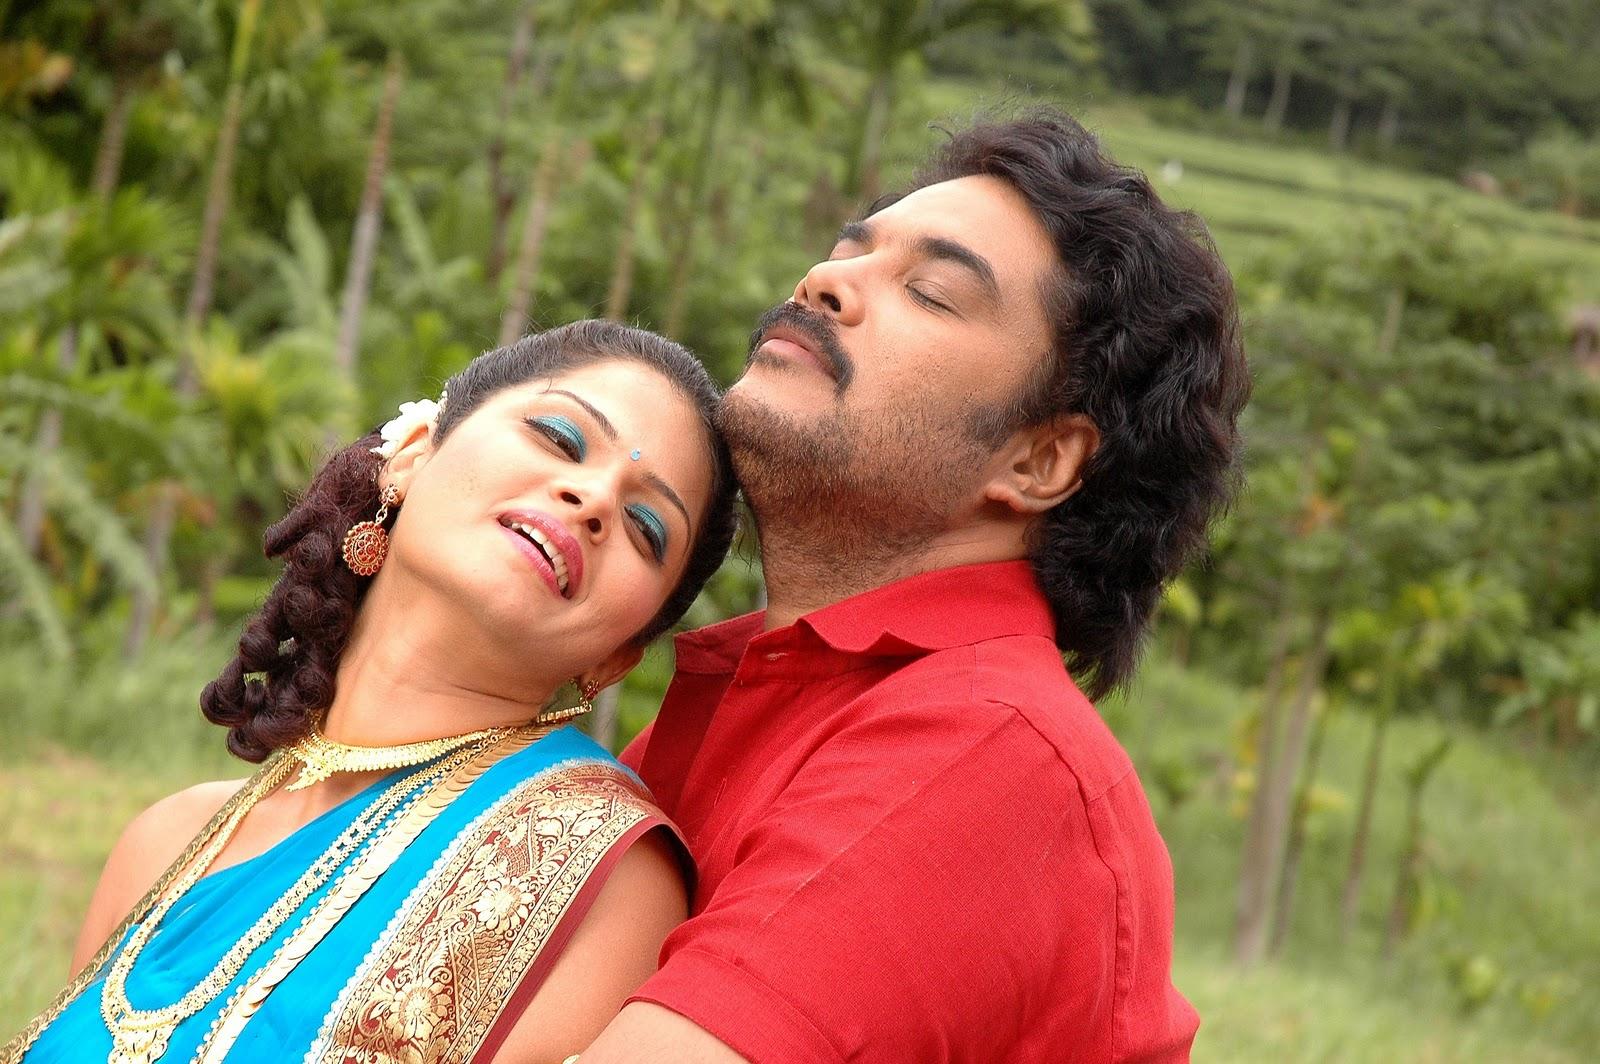 Nagaram Marupakkam actress Anuya hot stills Nagaram heroine Anuya sexy photos navel show